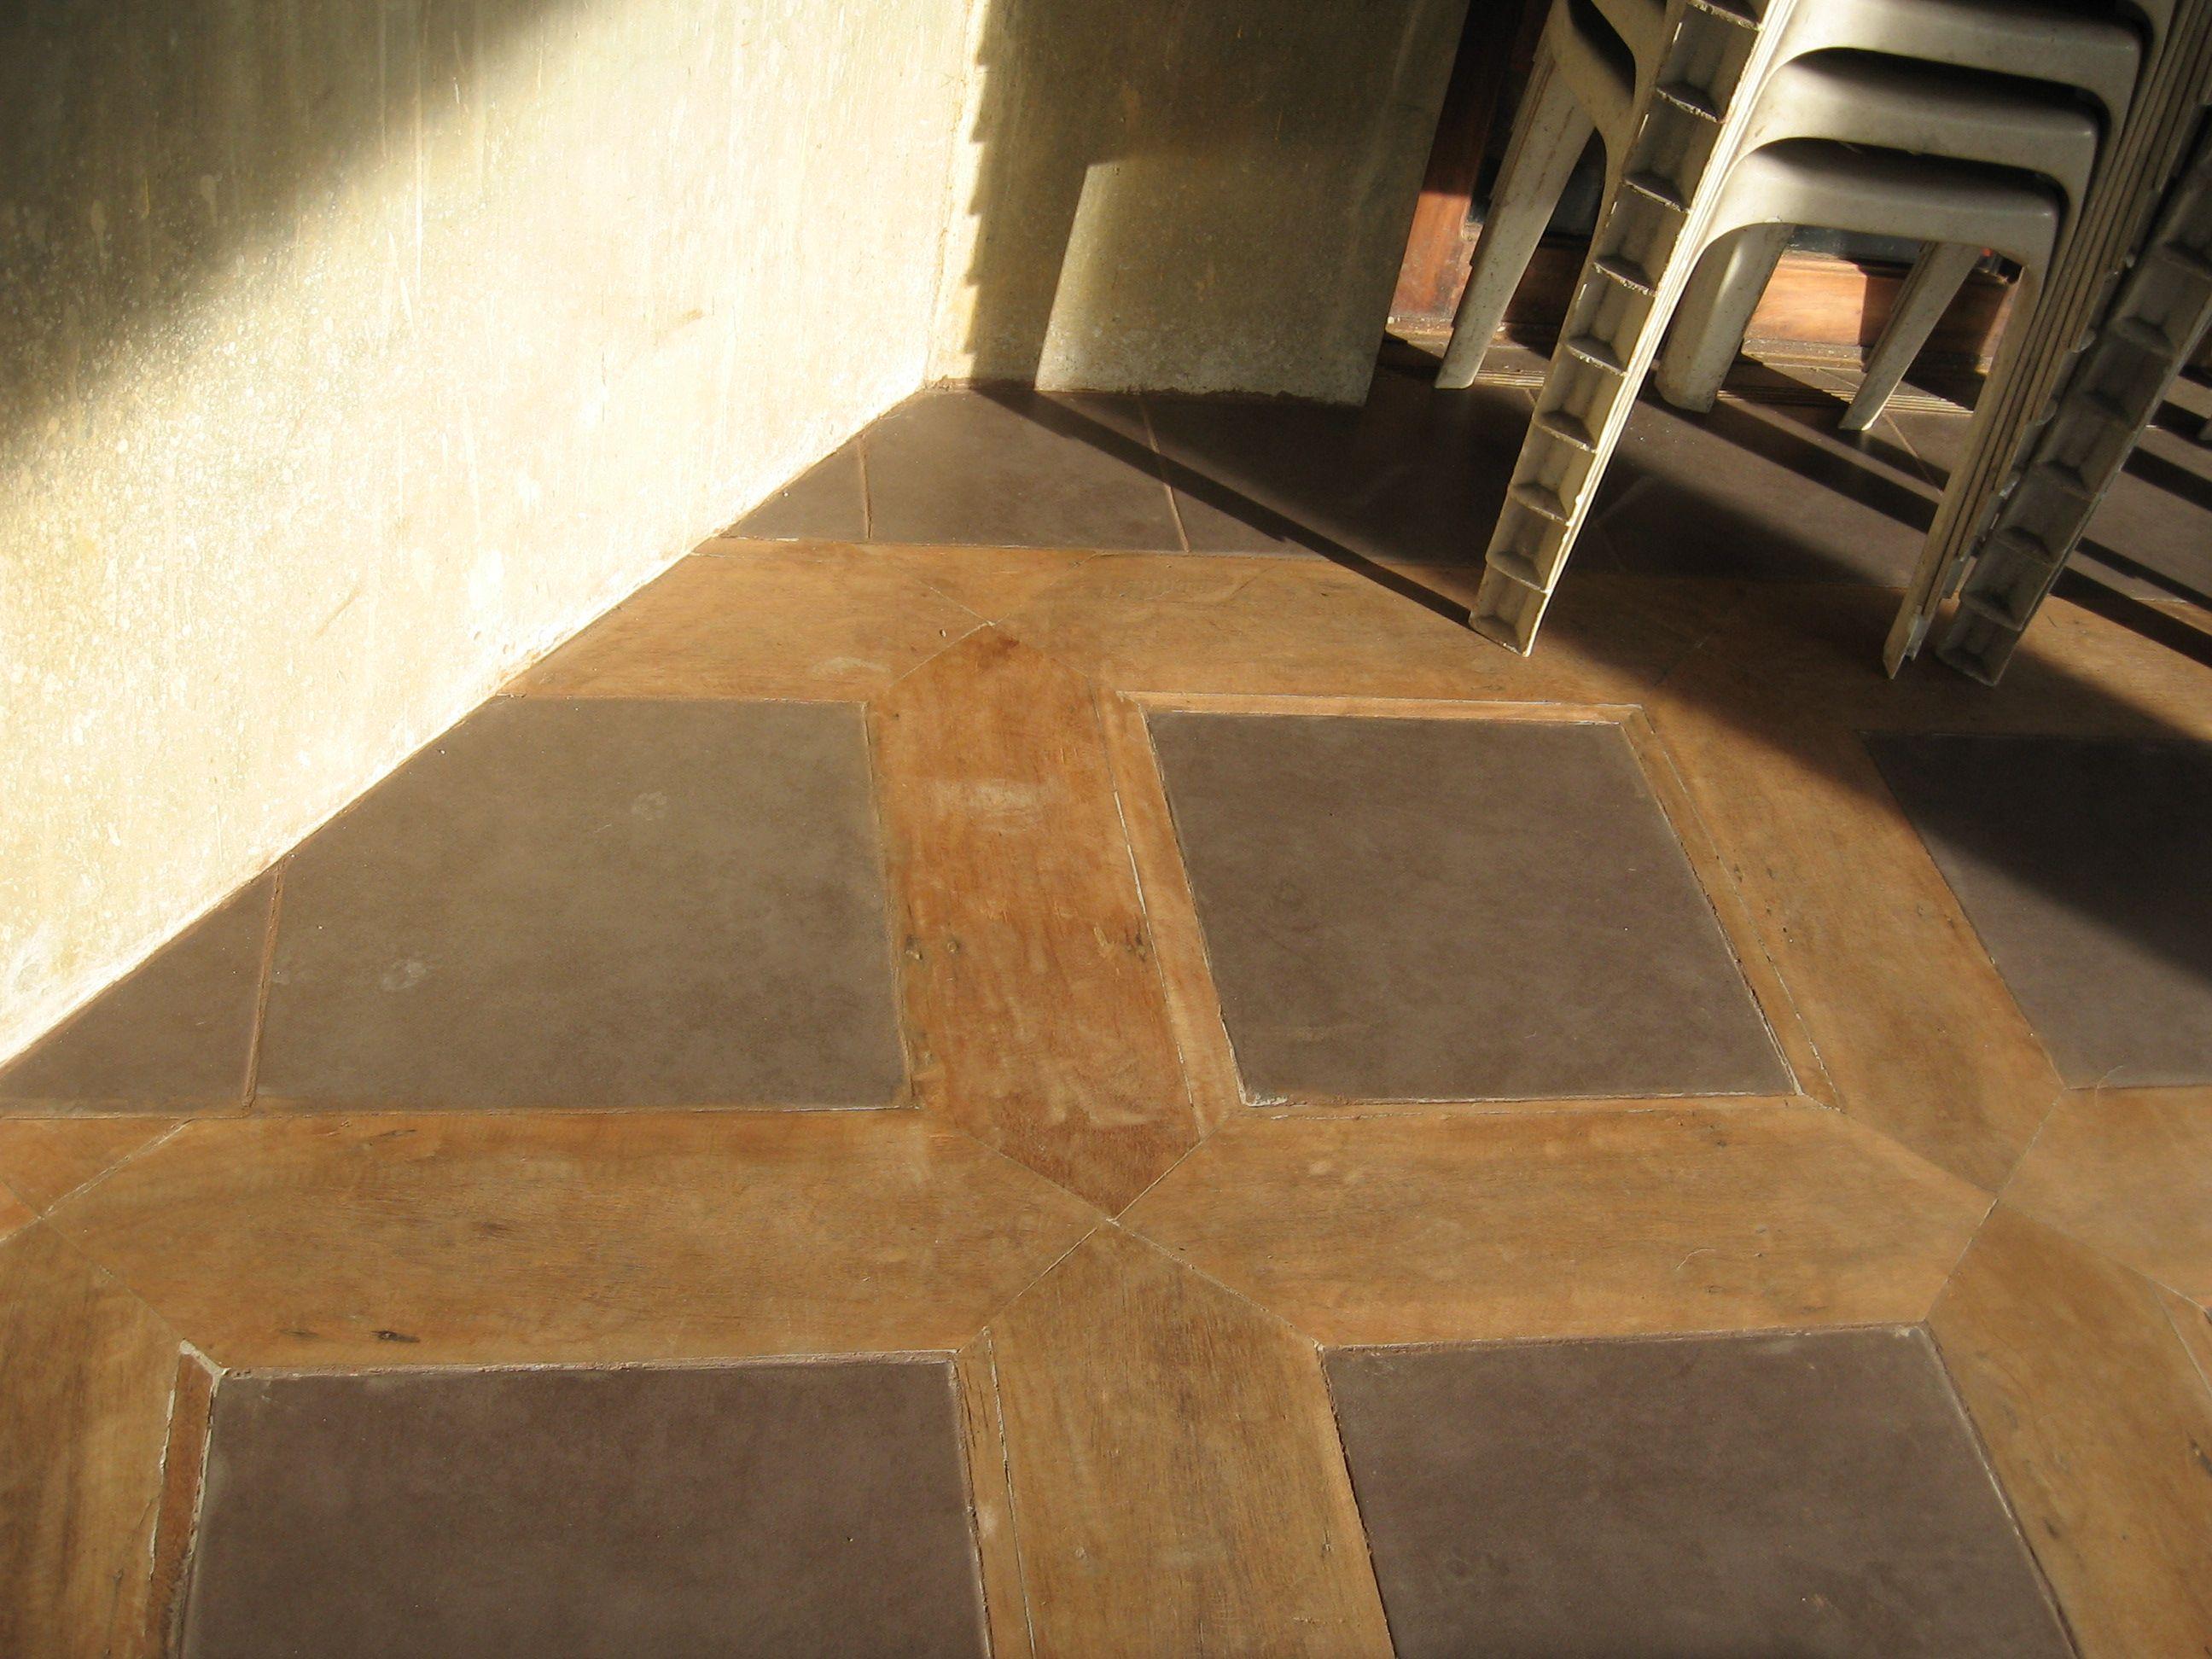 Anahaw galas two storey residence 2005 by jonathan montebon at resultado de imagem para wood flooring with tile inlays dailygadgetfo Choice Image